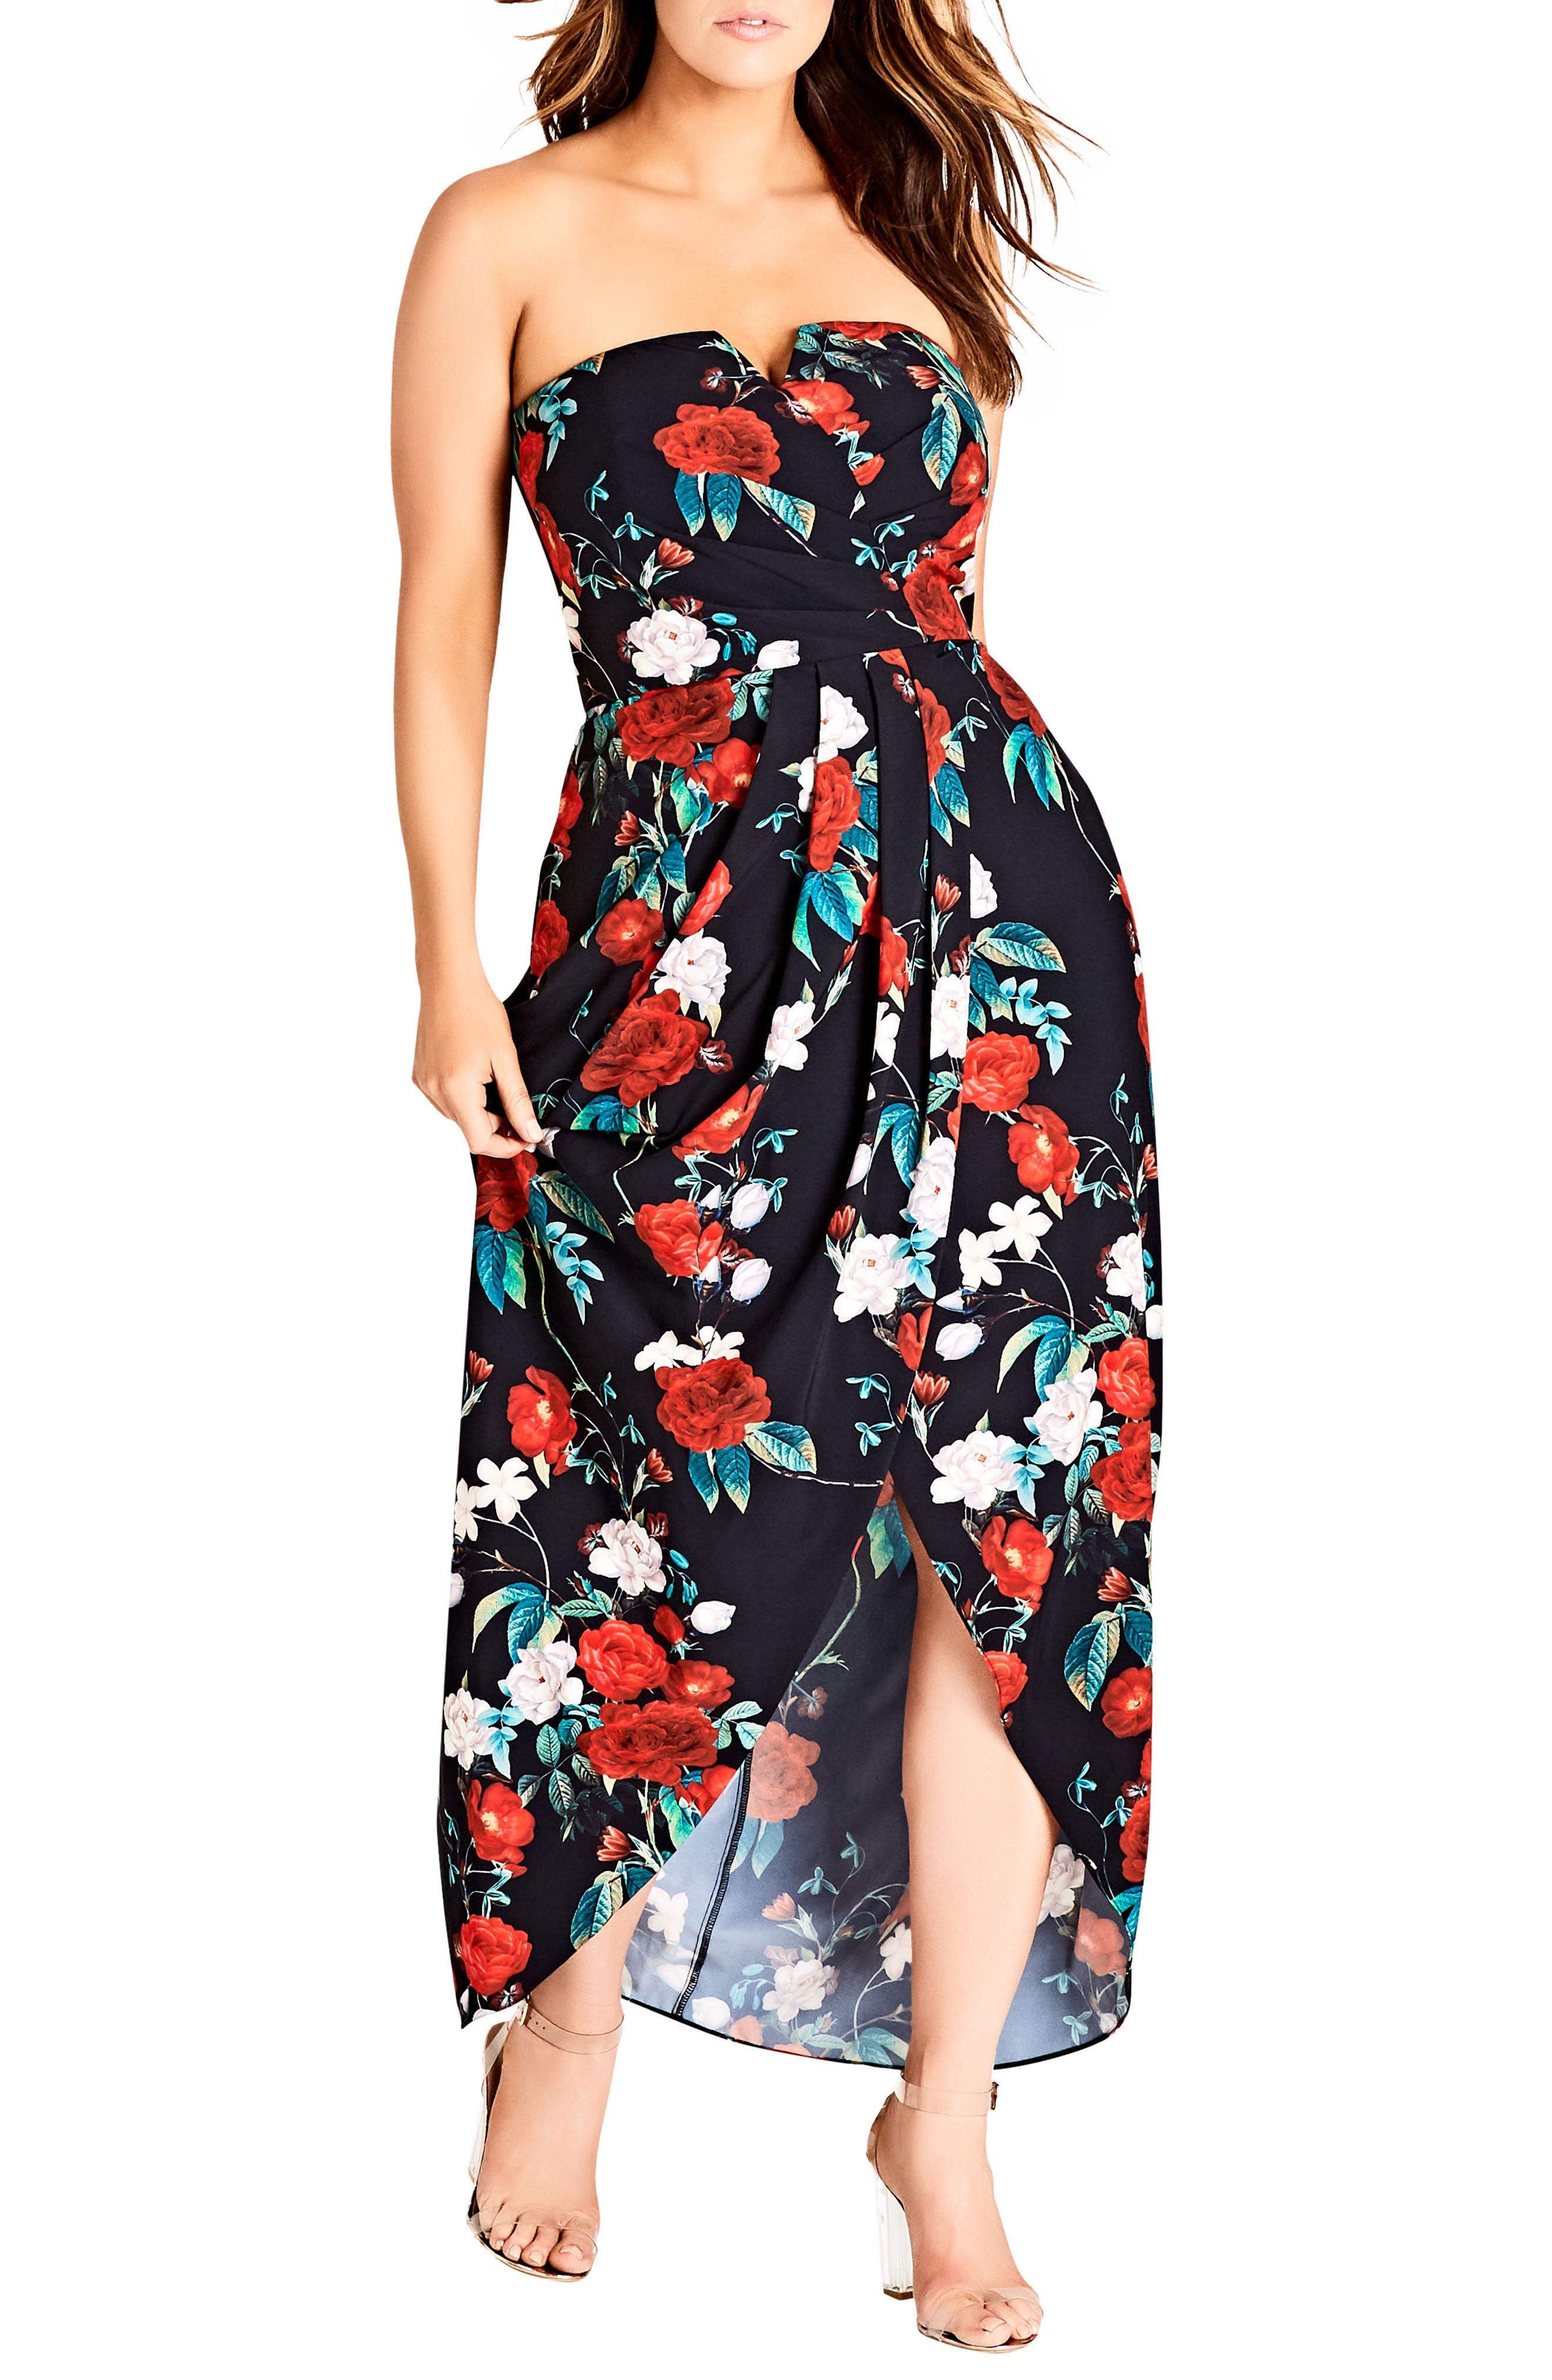 Come Hither Maxi Dress,                             Main thumbnail 1, color,                             ROSE ADORE